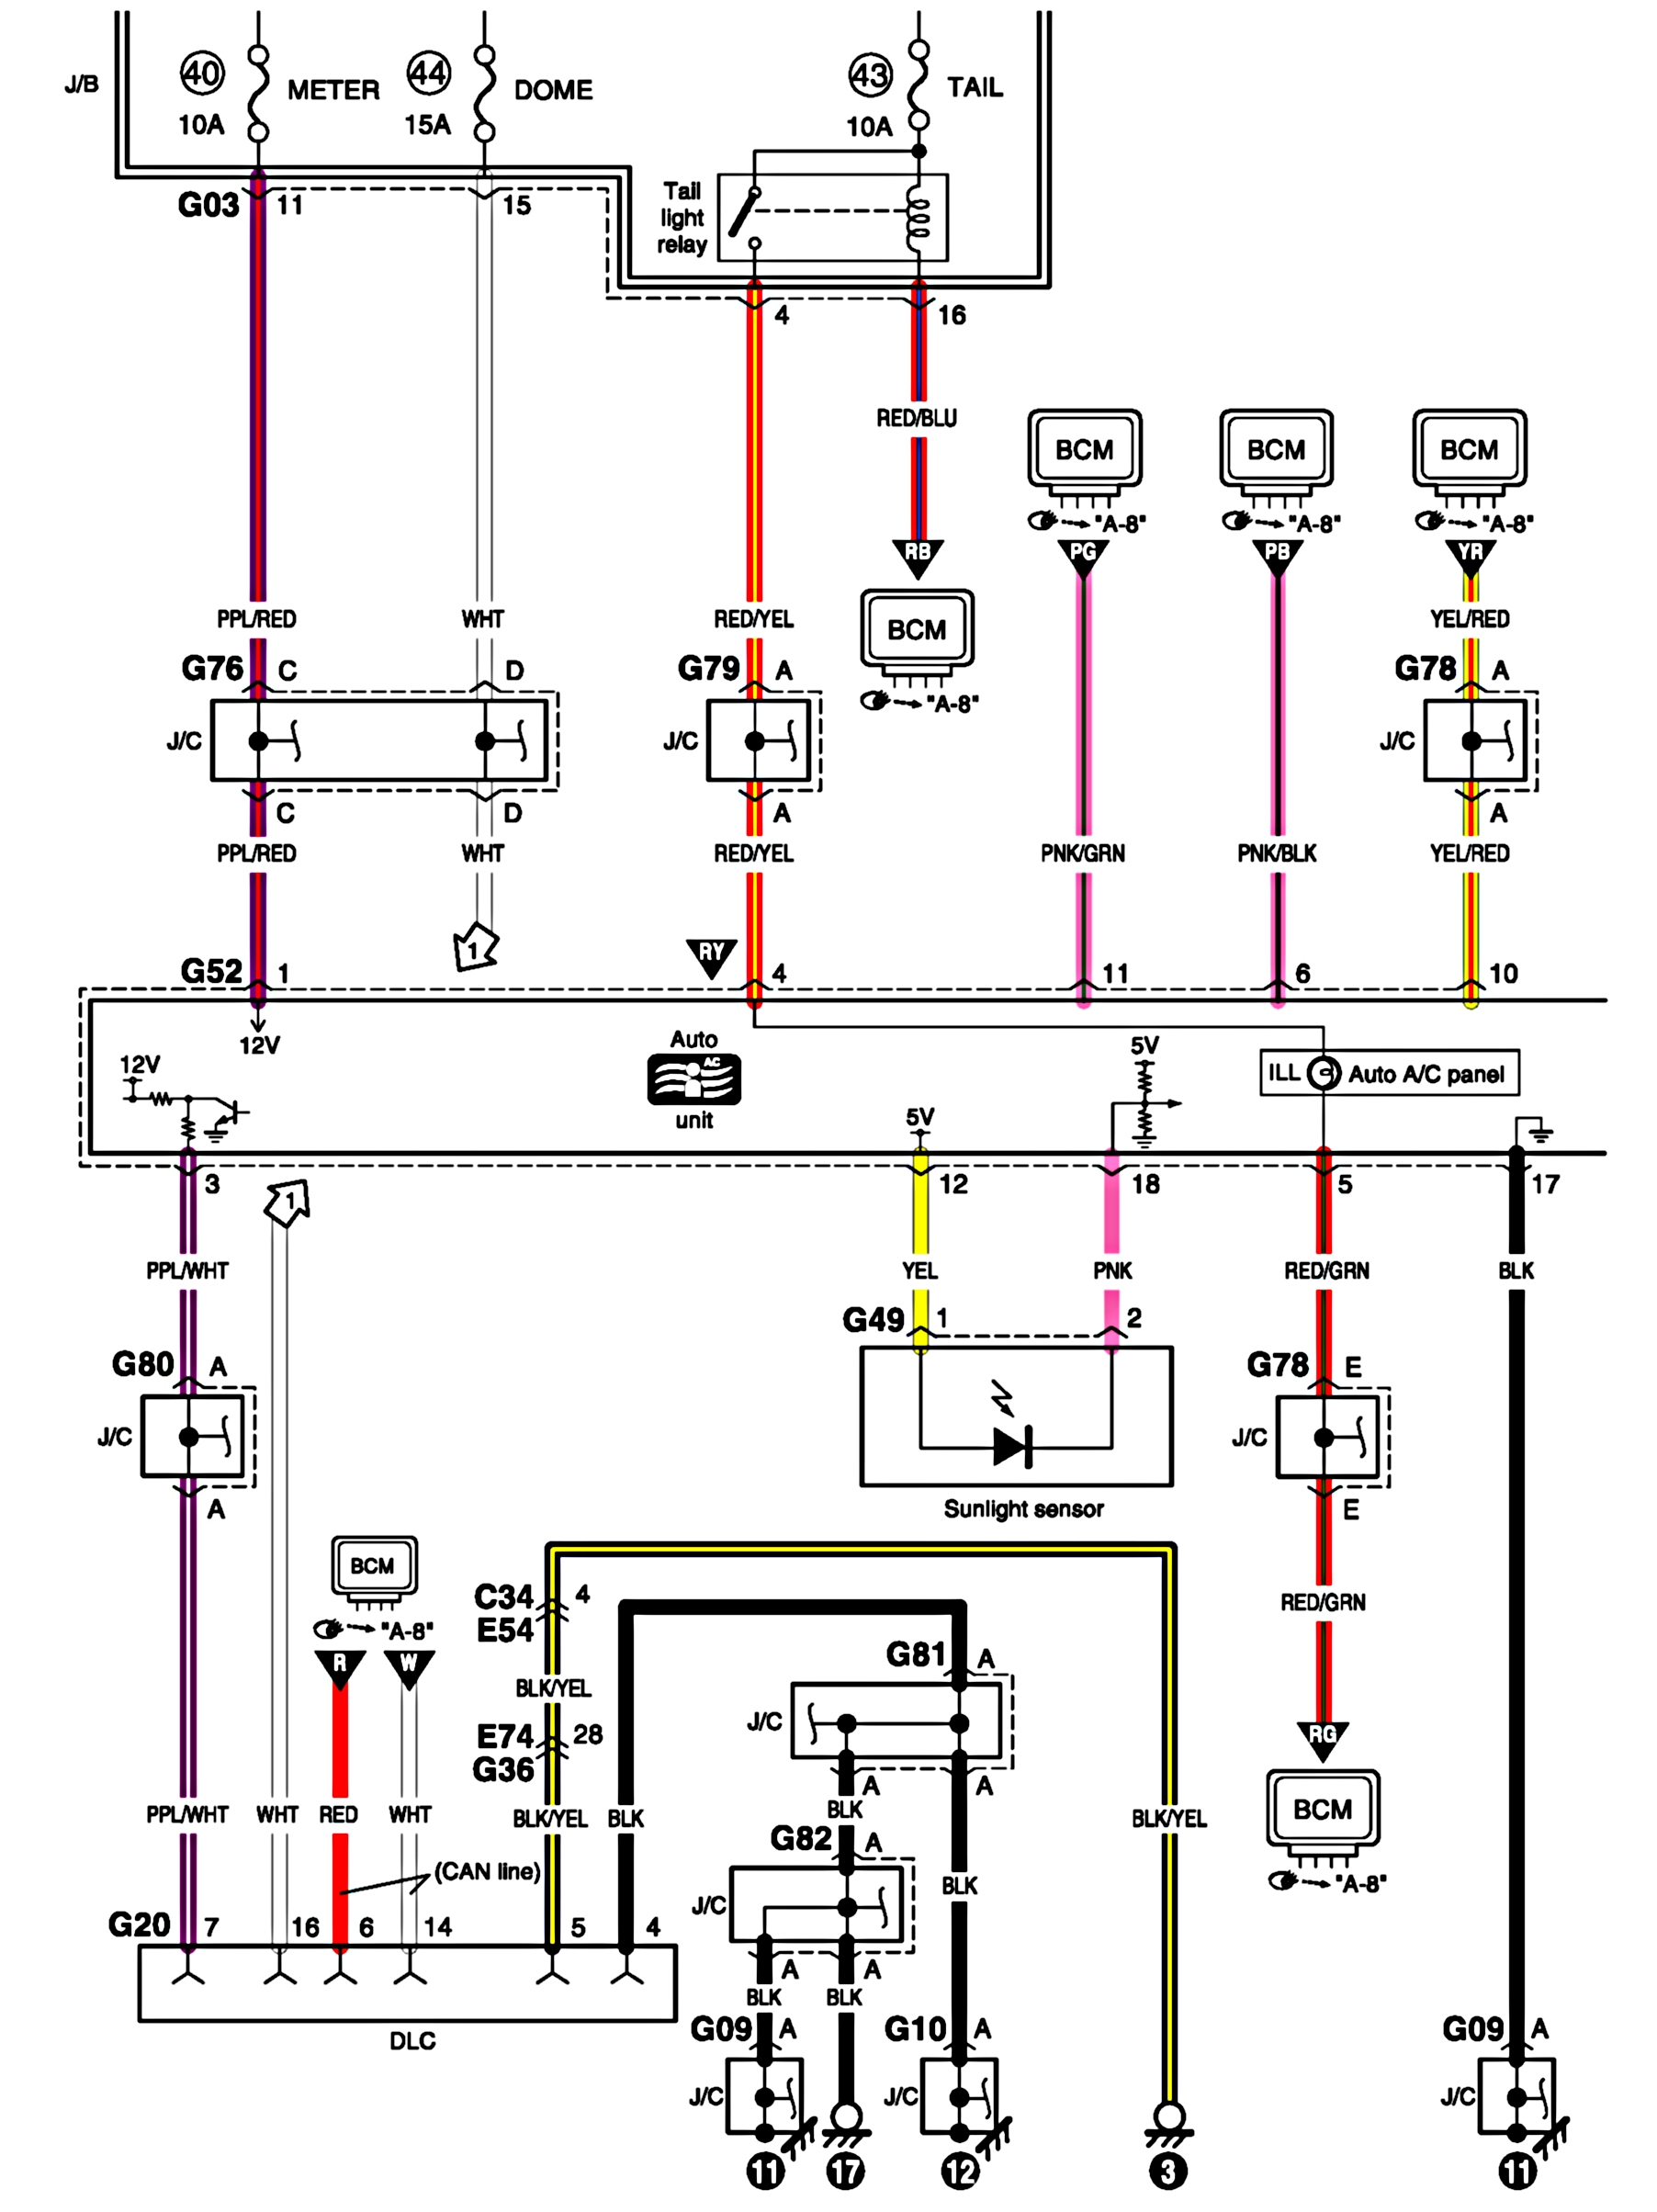 2012 suzuki grand vitara wiring diagram 2012 wiring diagrams 2006 suzuki grand vitara wiring diagram 2006 grand vitara